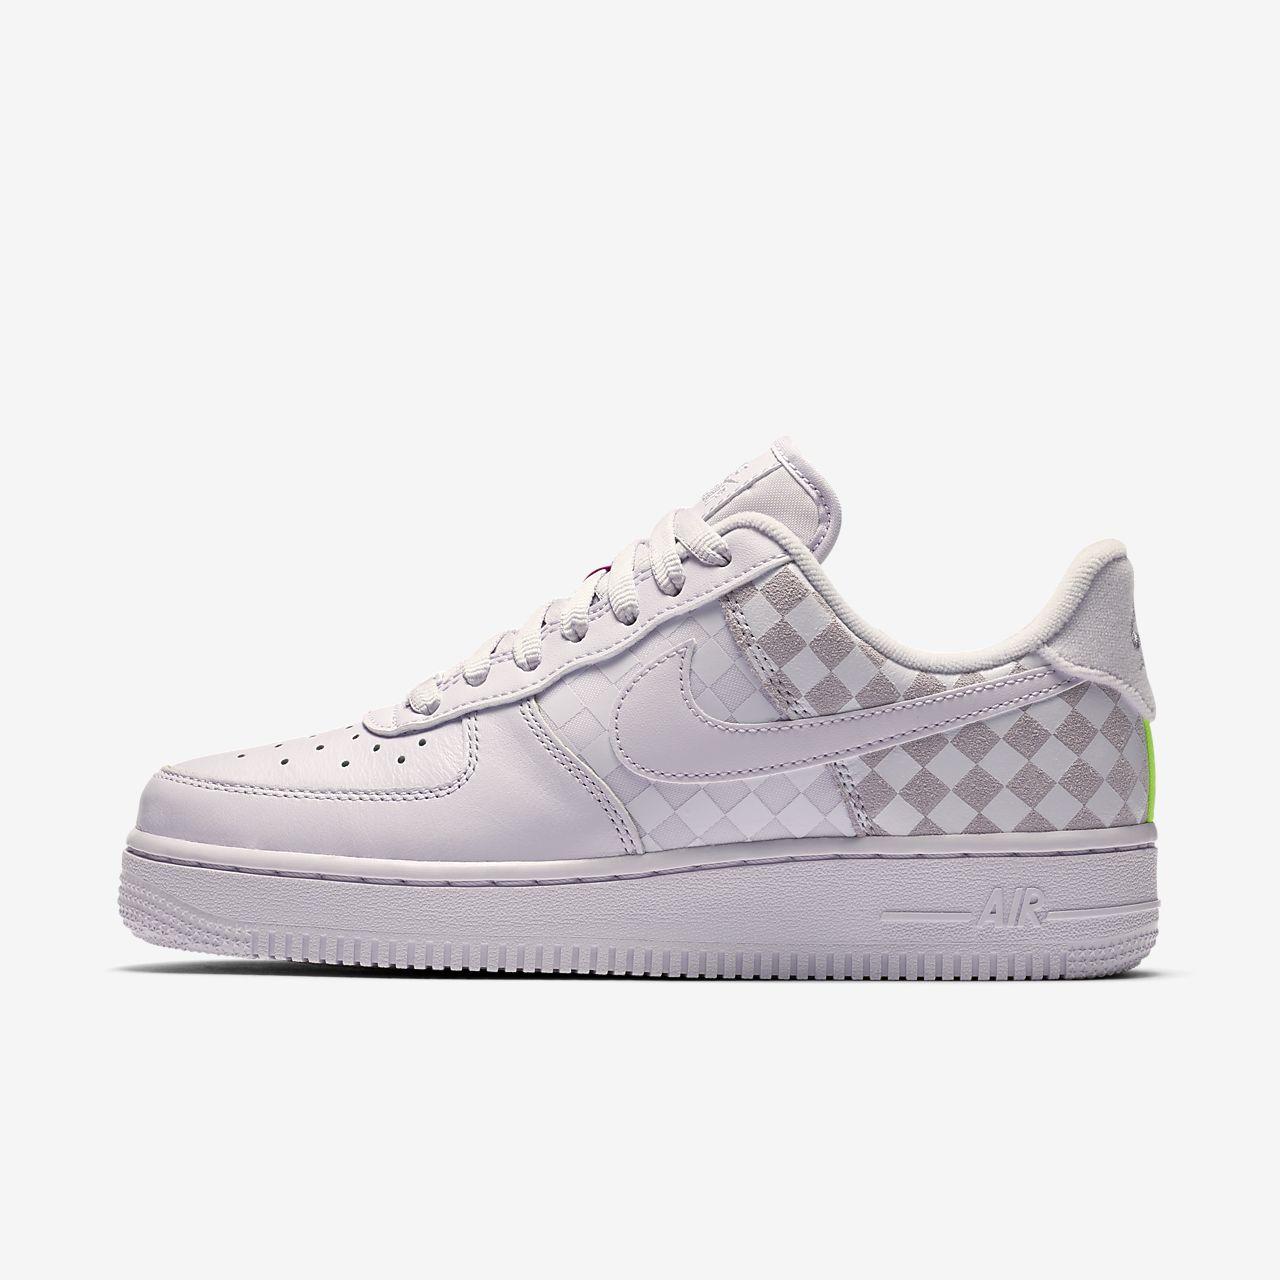 Sapatilhas axadrezadas Nike Air Force 1 Low para mulher